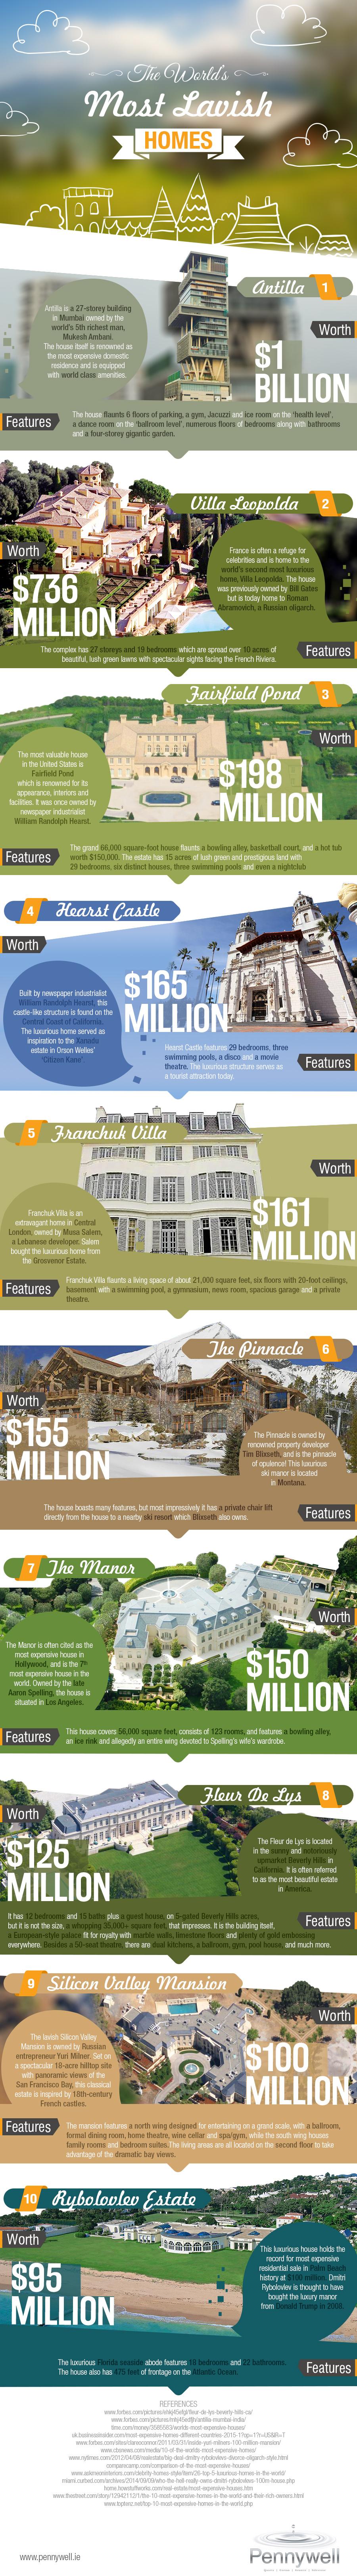 Lavish Homes: The World's Top Ten List - Infographic